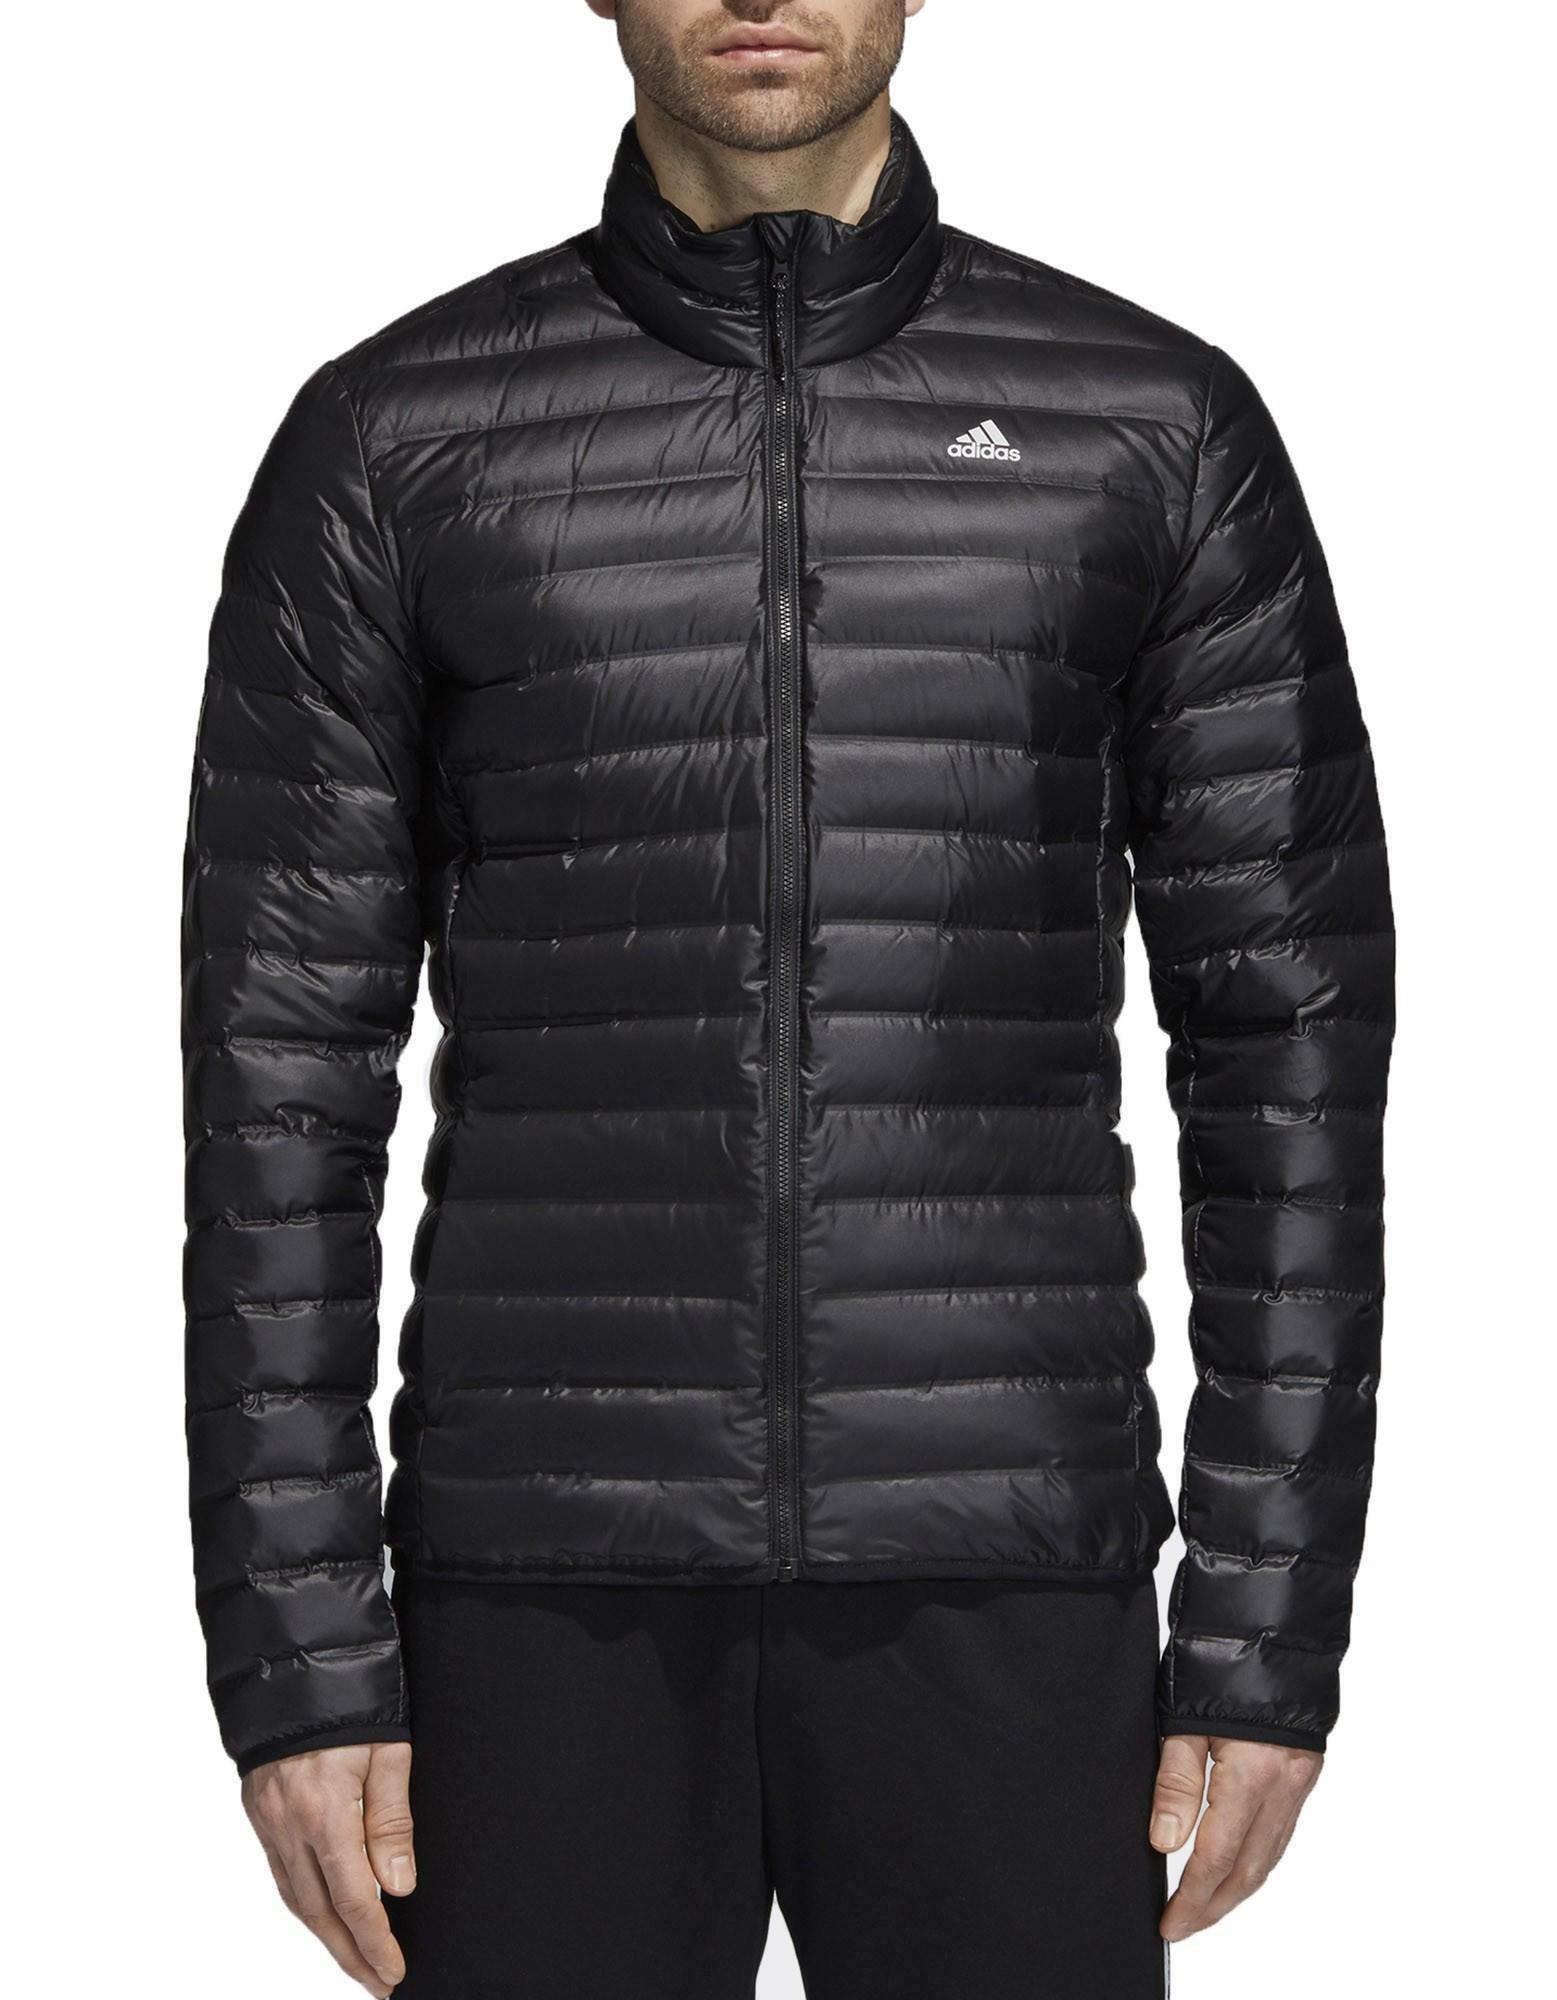 timeless design 4d36f 89137 Adidas w varilite giacca piumino 100 grammi uomo nero bs1588